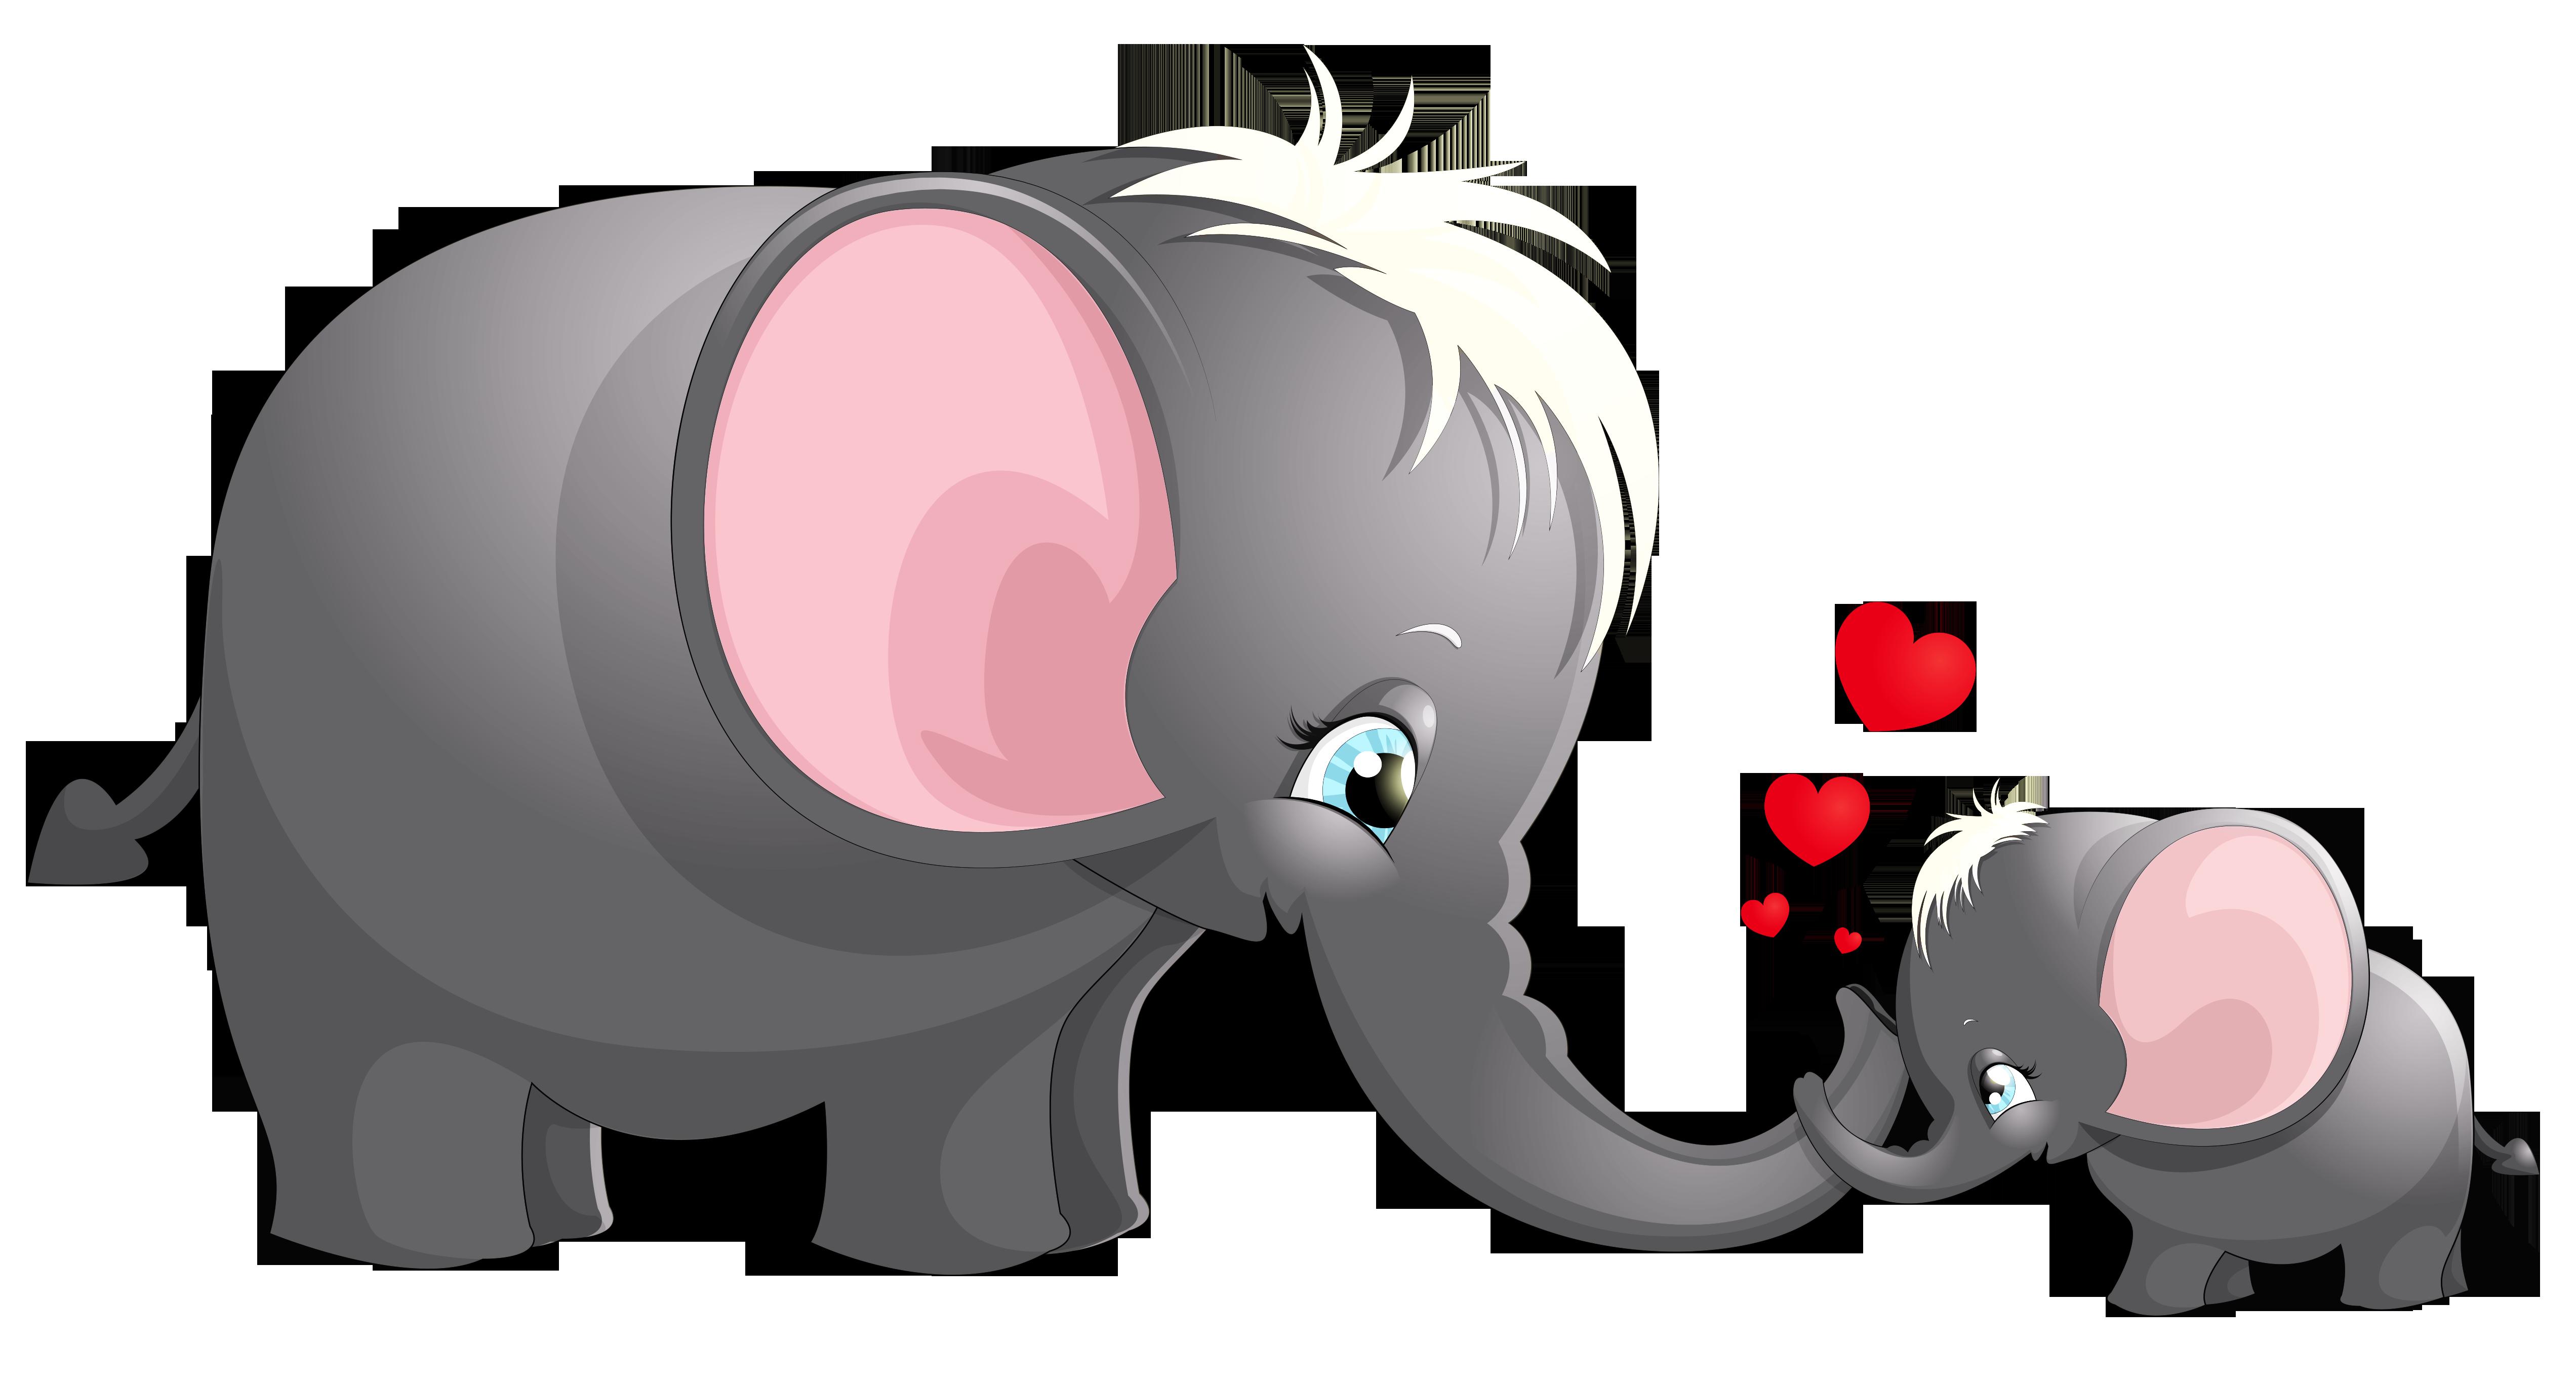 Elephants clipart heart, Elephants heart Transparent FREE ...